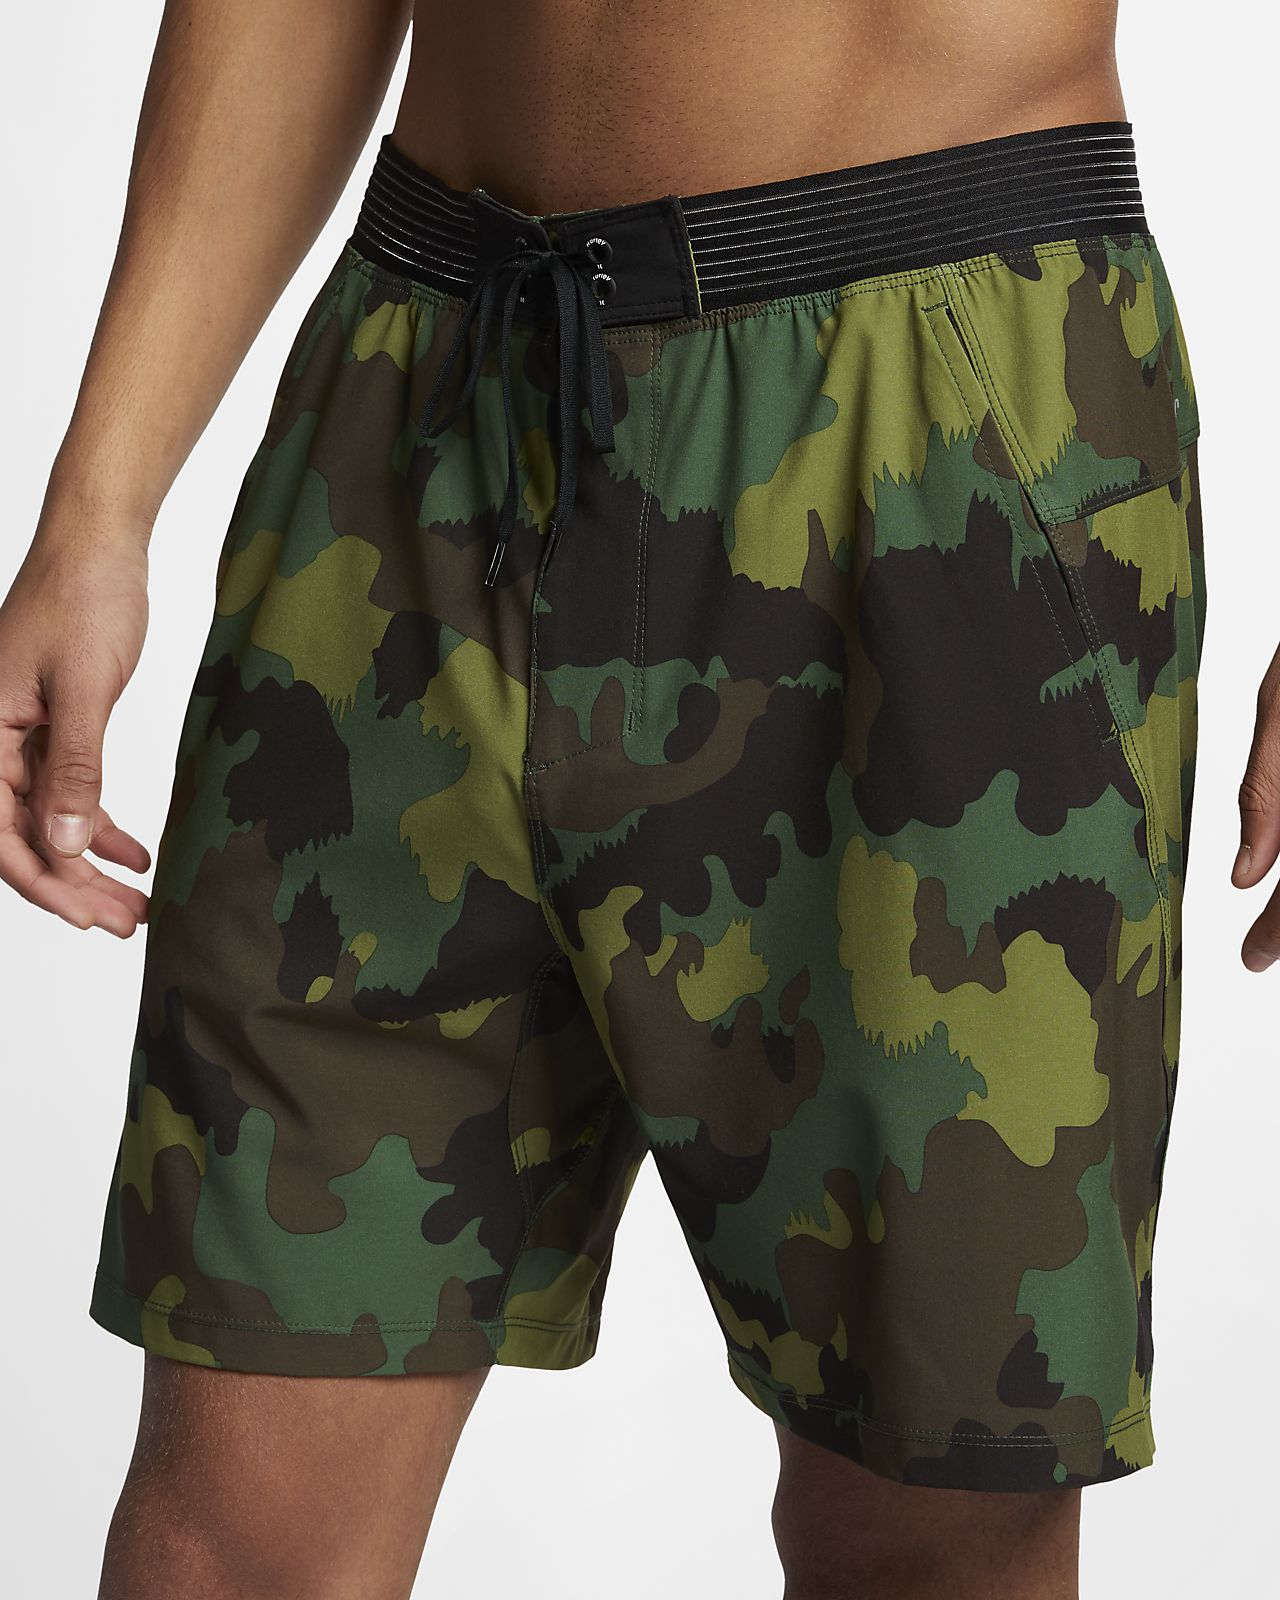 Hurley Phantom Alpha Trainer Pantalón corto de camuflaje de 46 cm - Hombre